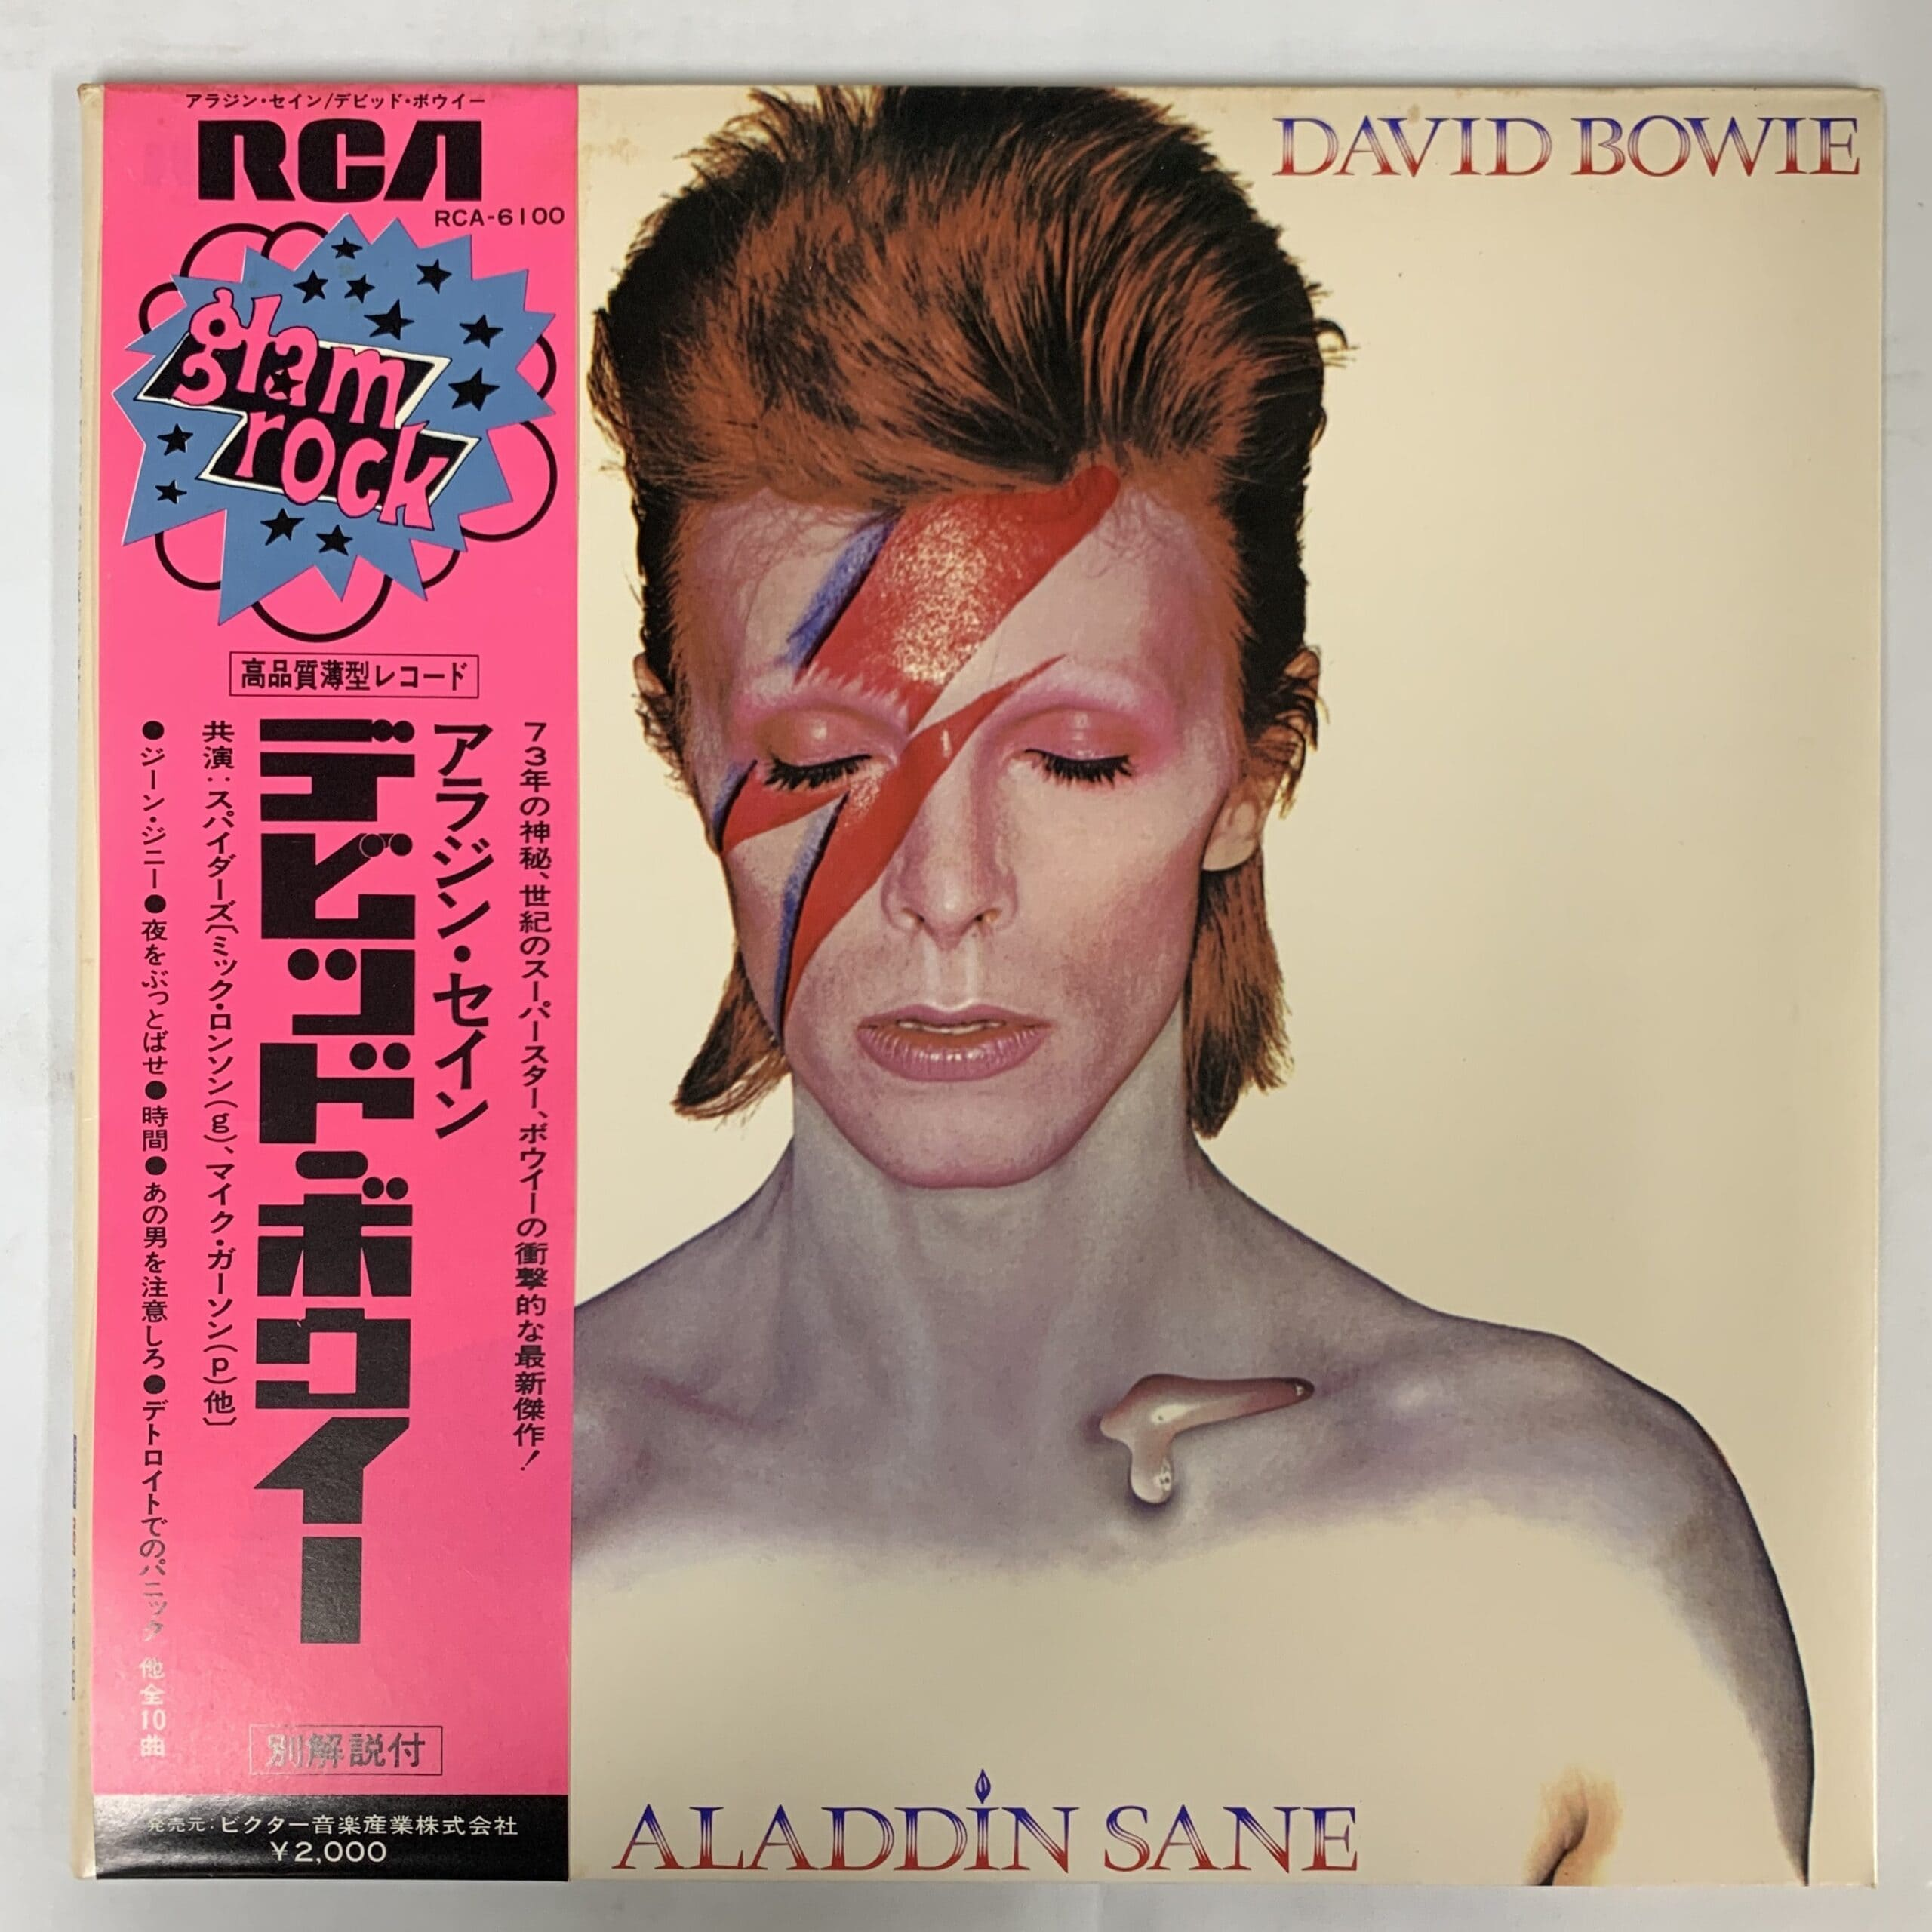 David Bowie / Aladdin Sane / RCA-6100 / glam rock帯付